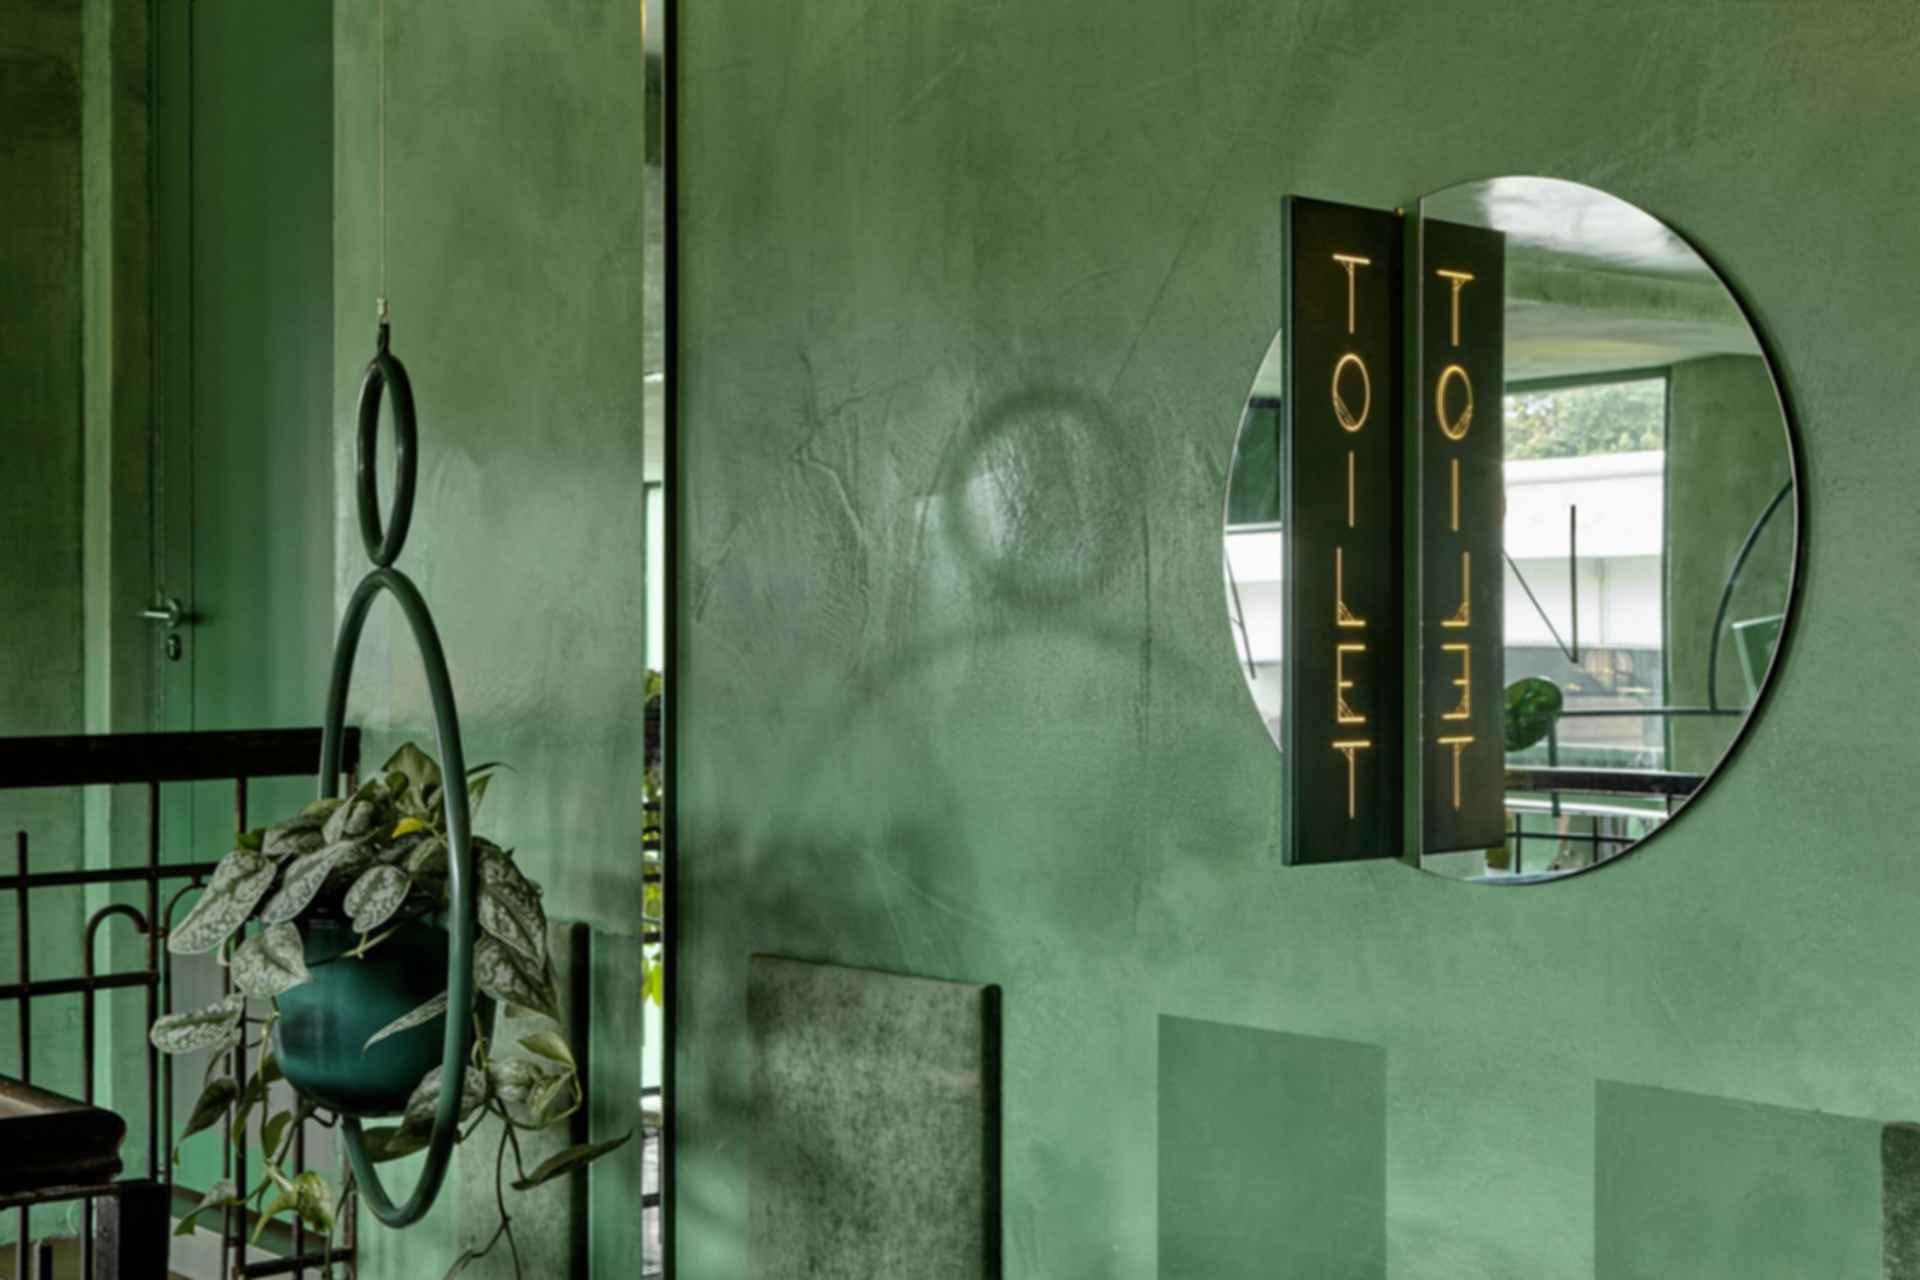 Bar Botanique Cafe Tropique - Interior/Toilet Sign